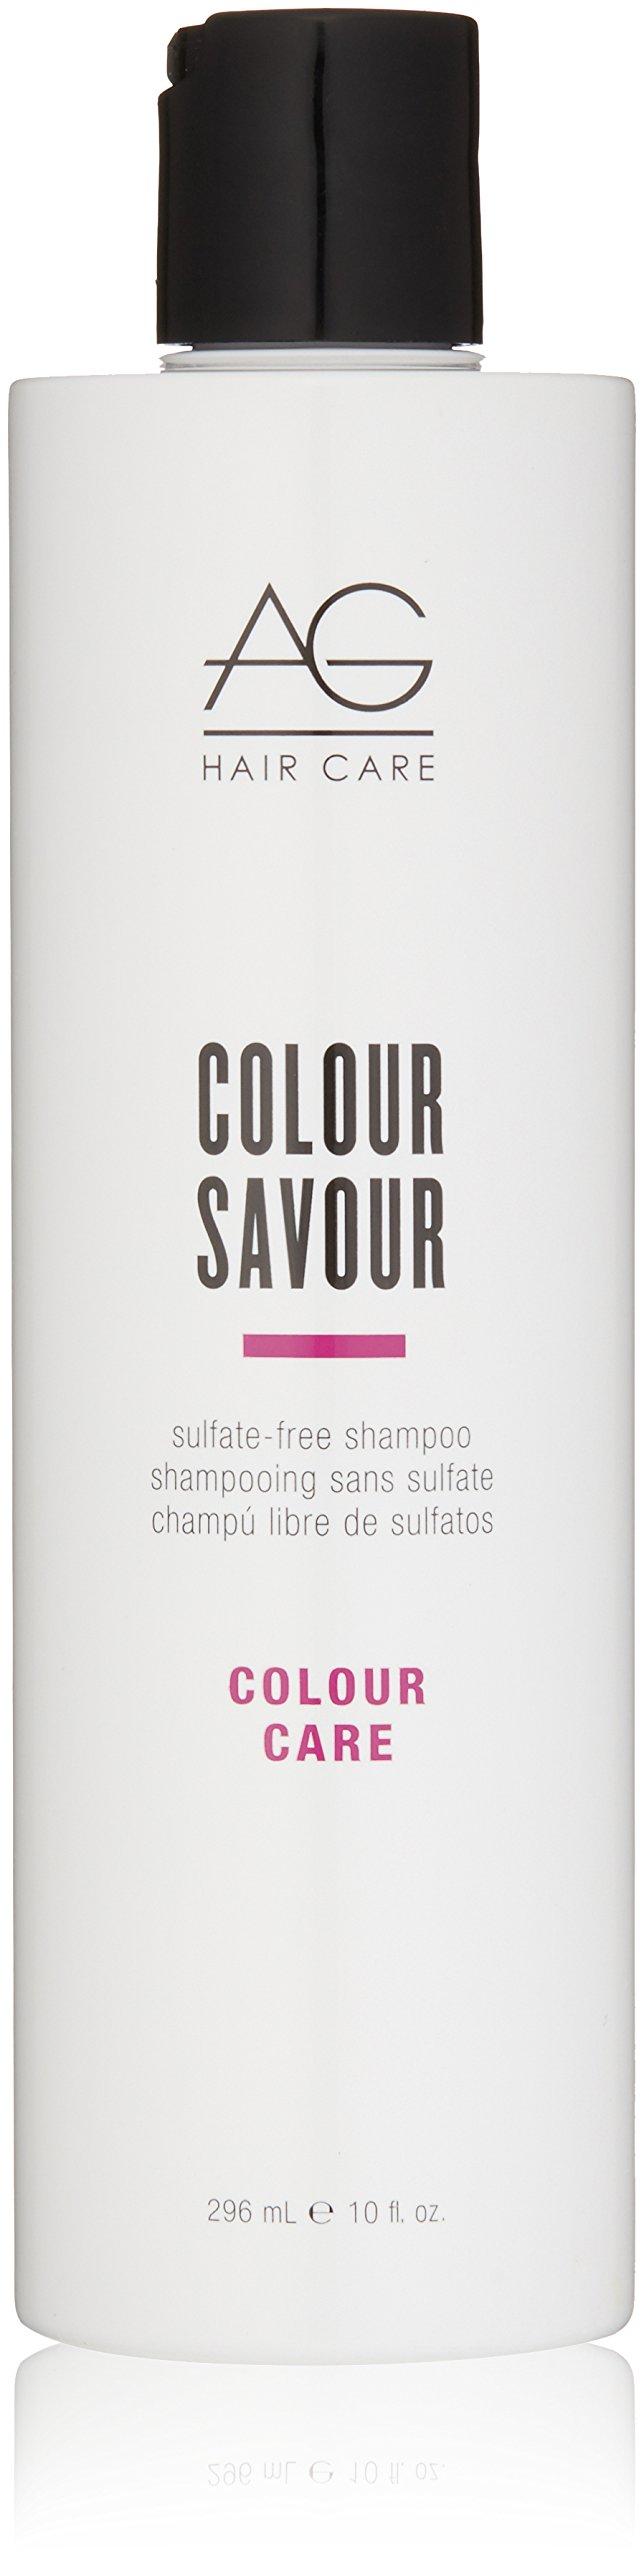 AG Hair Colour Care Colour Savour Sulfate-Free Shampoo 10 fl. oz.